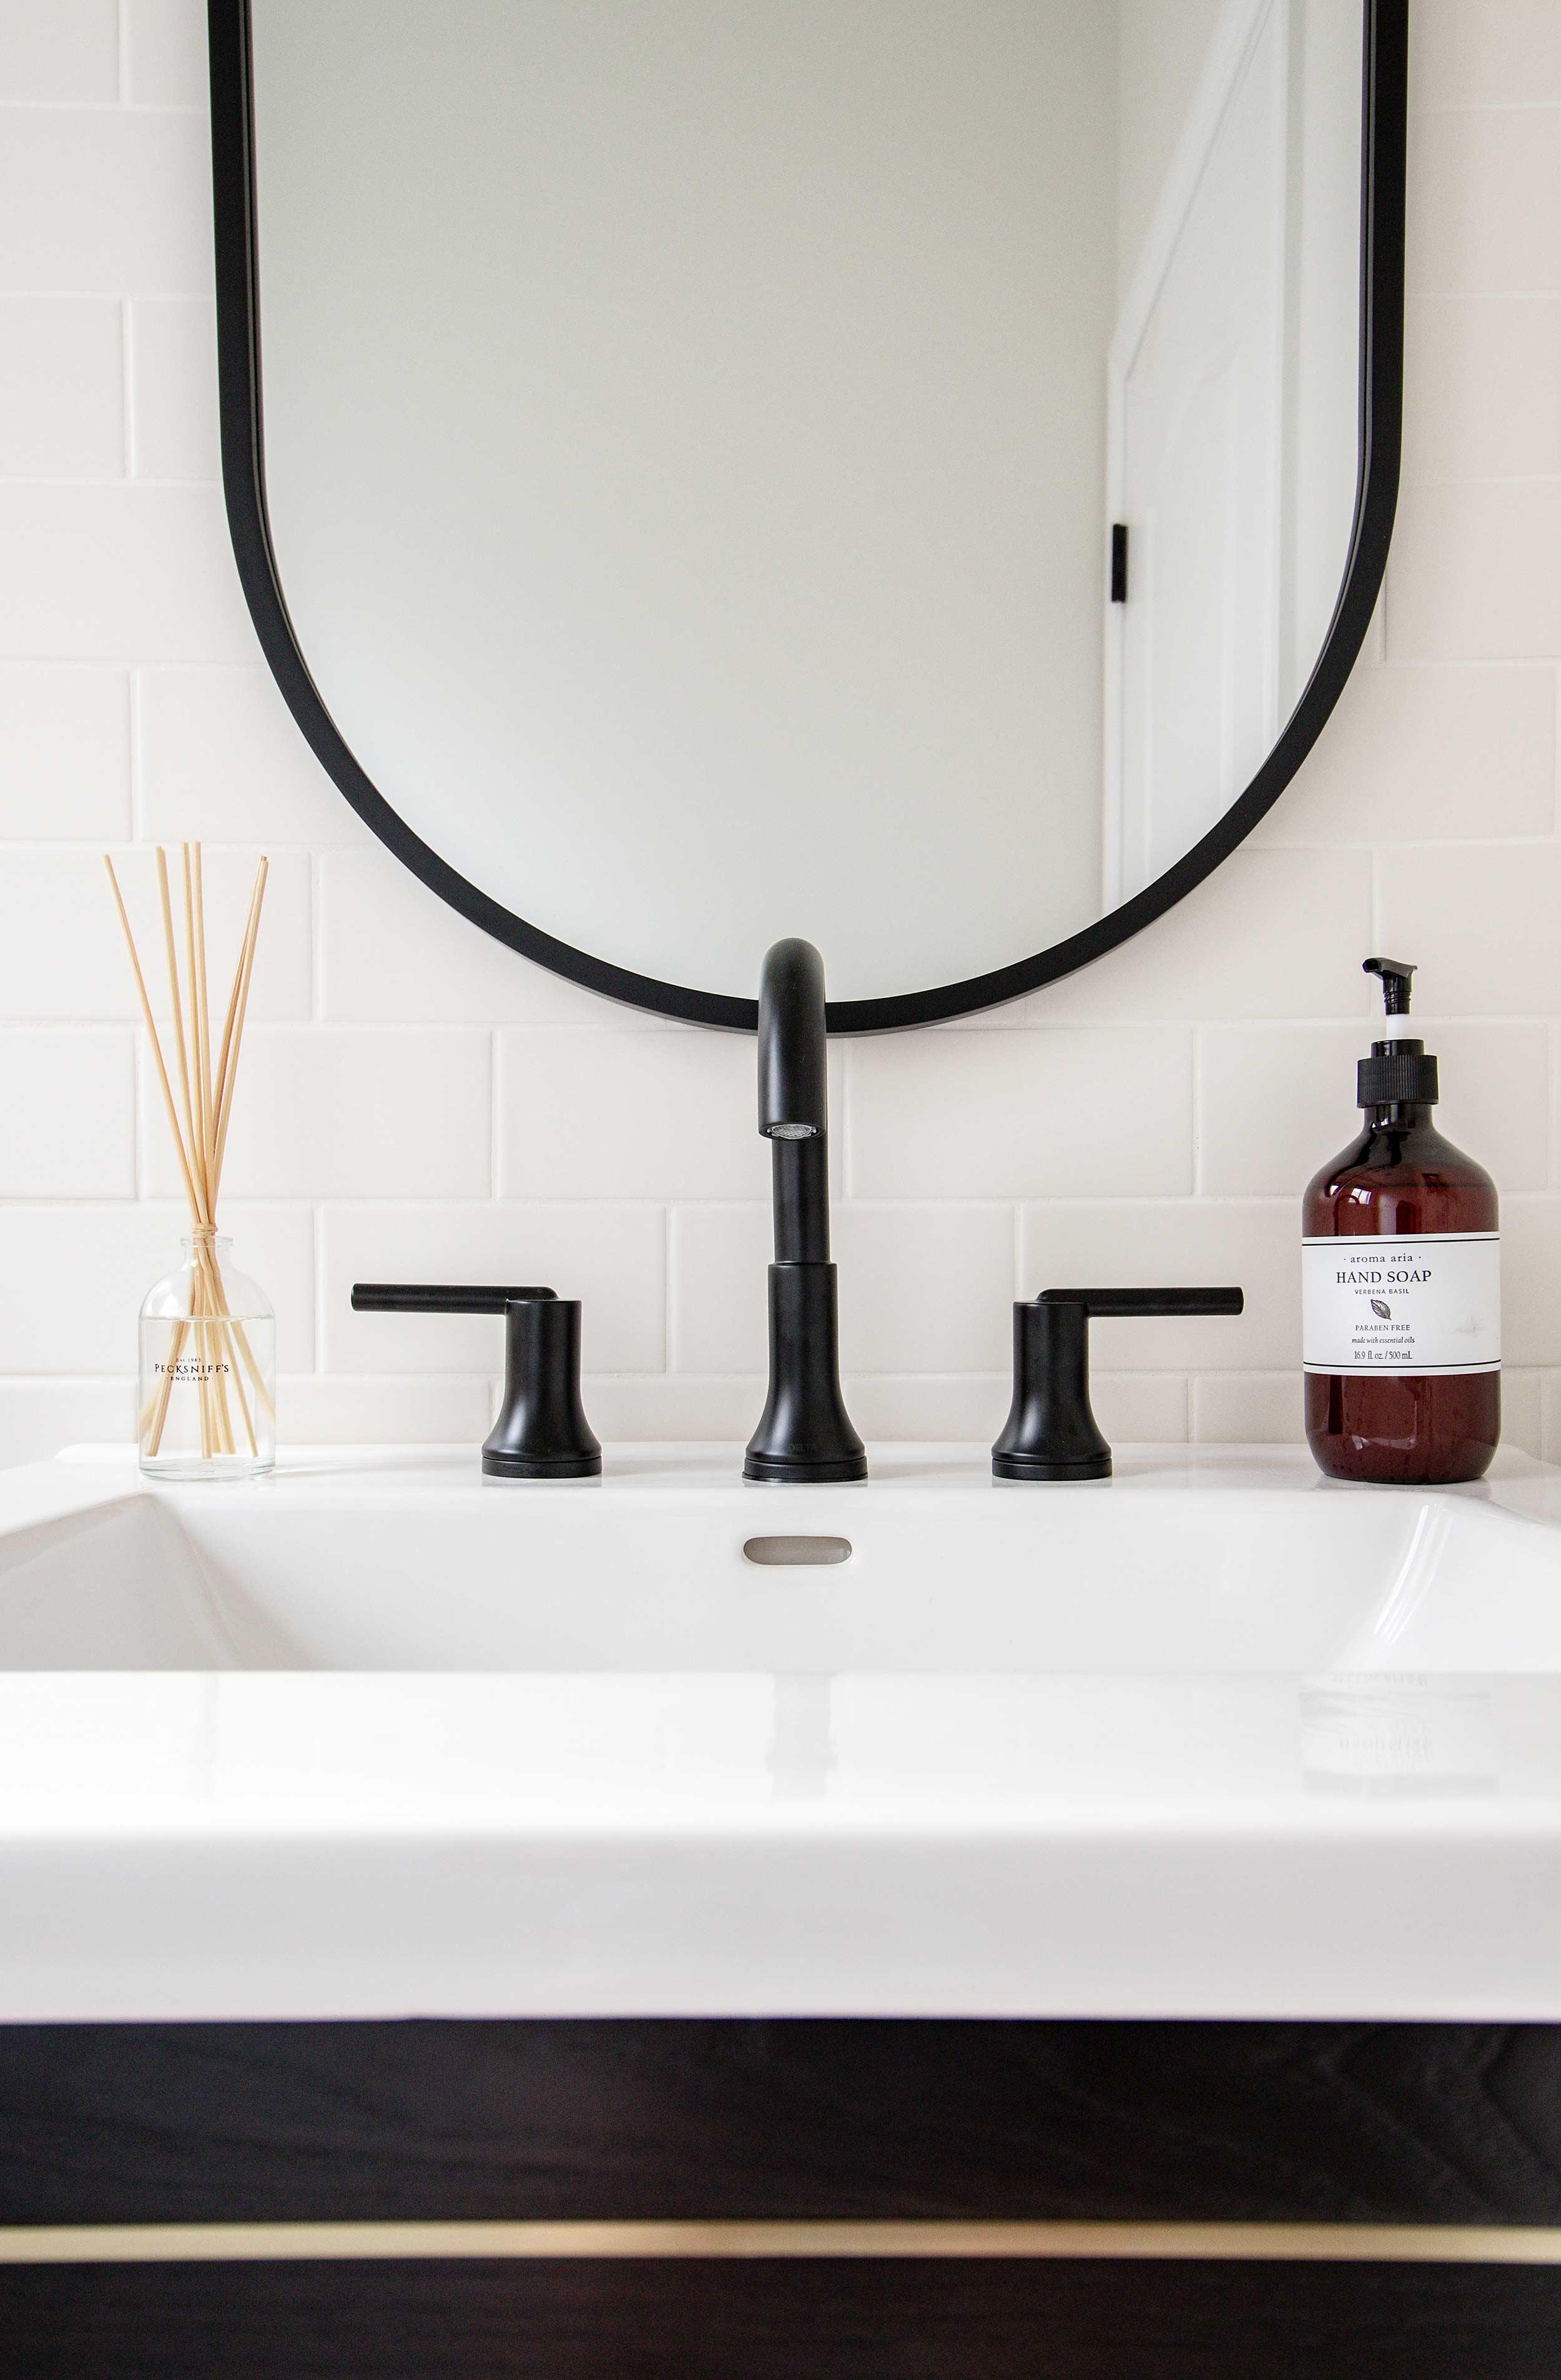 Delta Trinsic Widespread Faucet in Farmhouse Bathroom